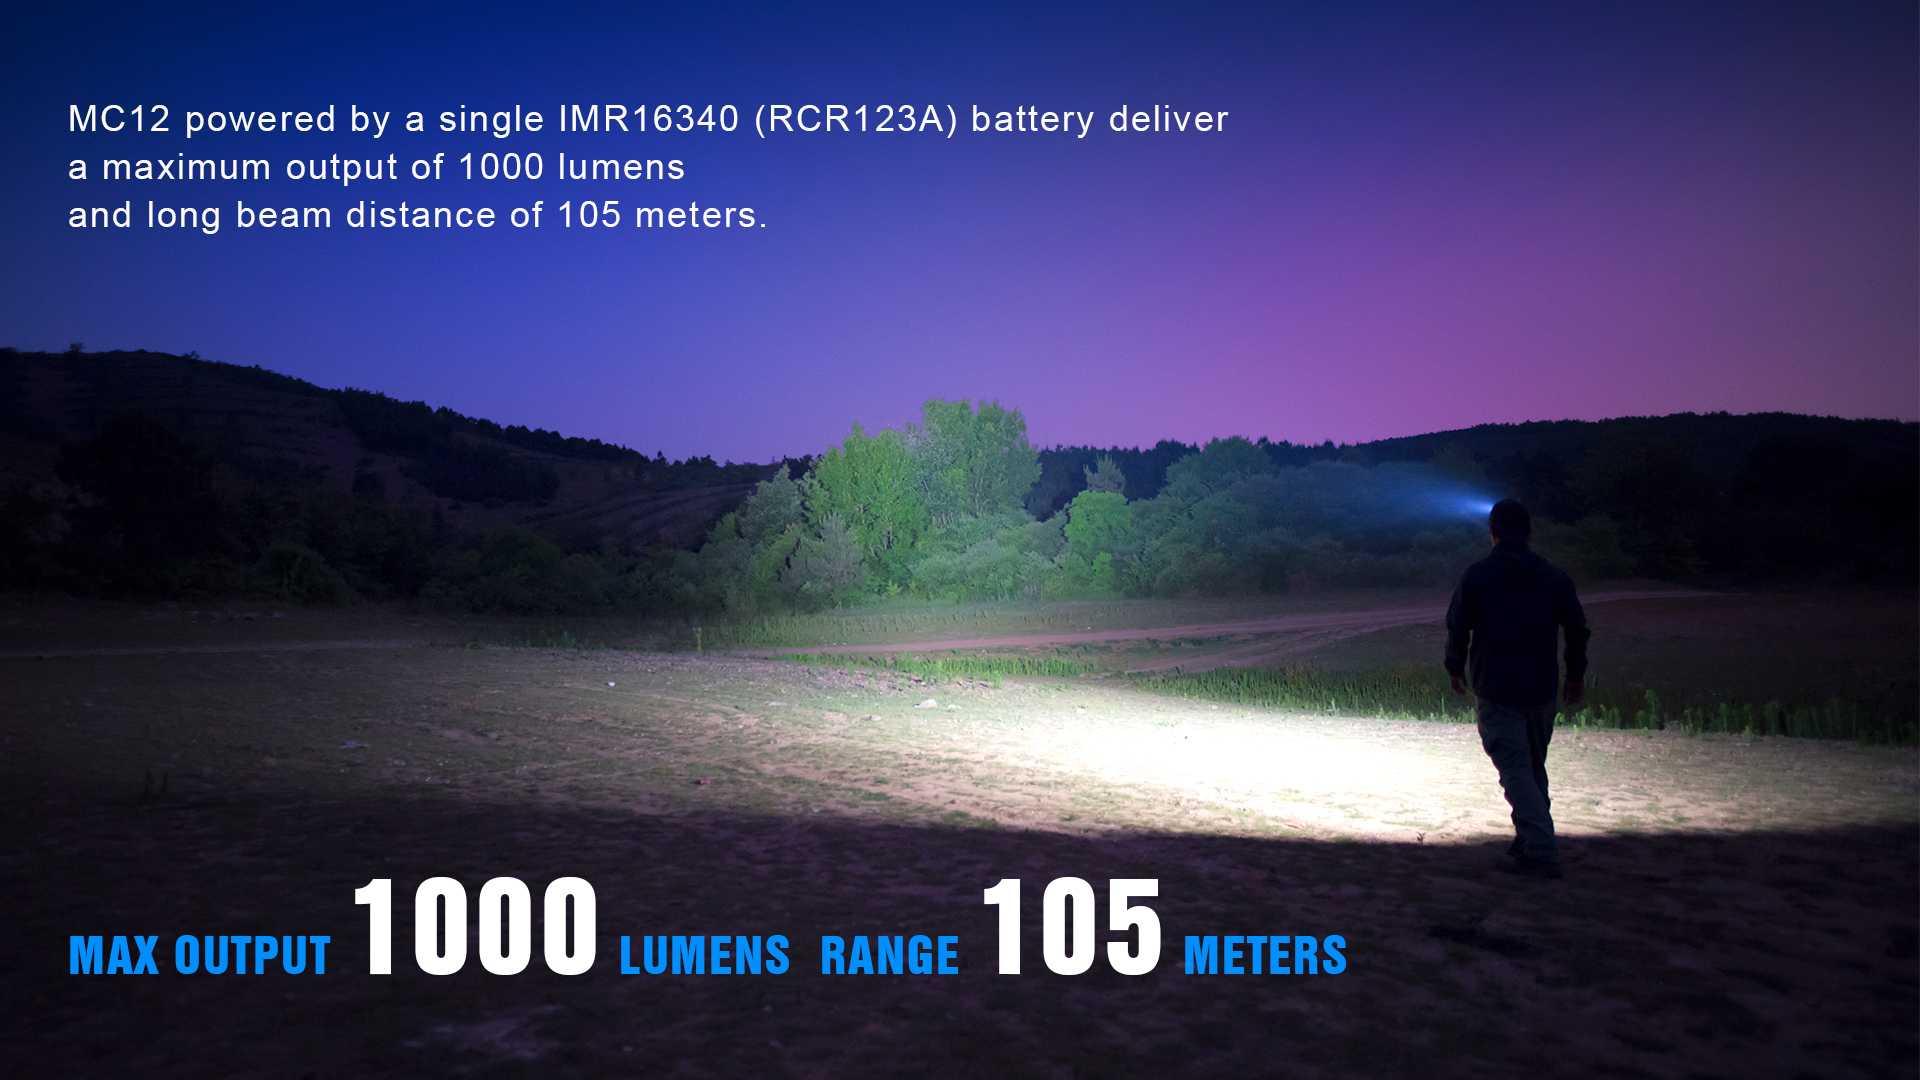 1000lm usb recarregável led farol com megnetic para a caça, acampamento